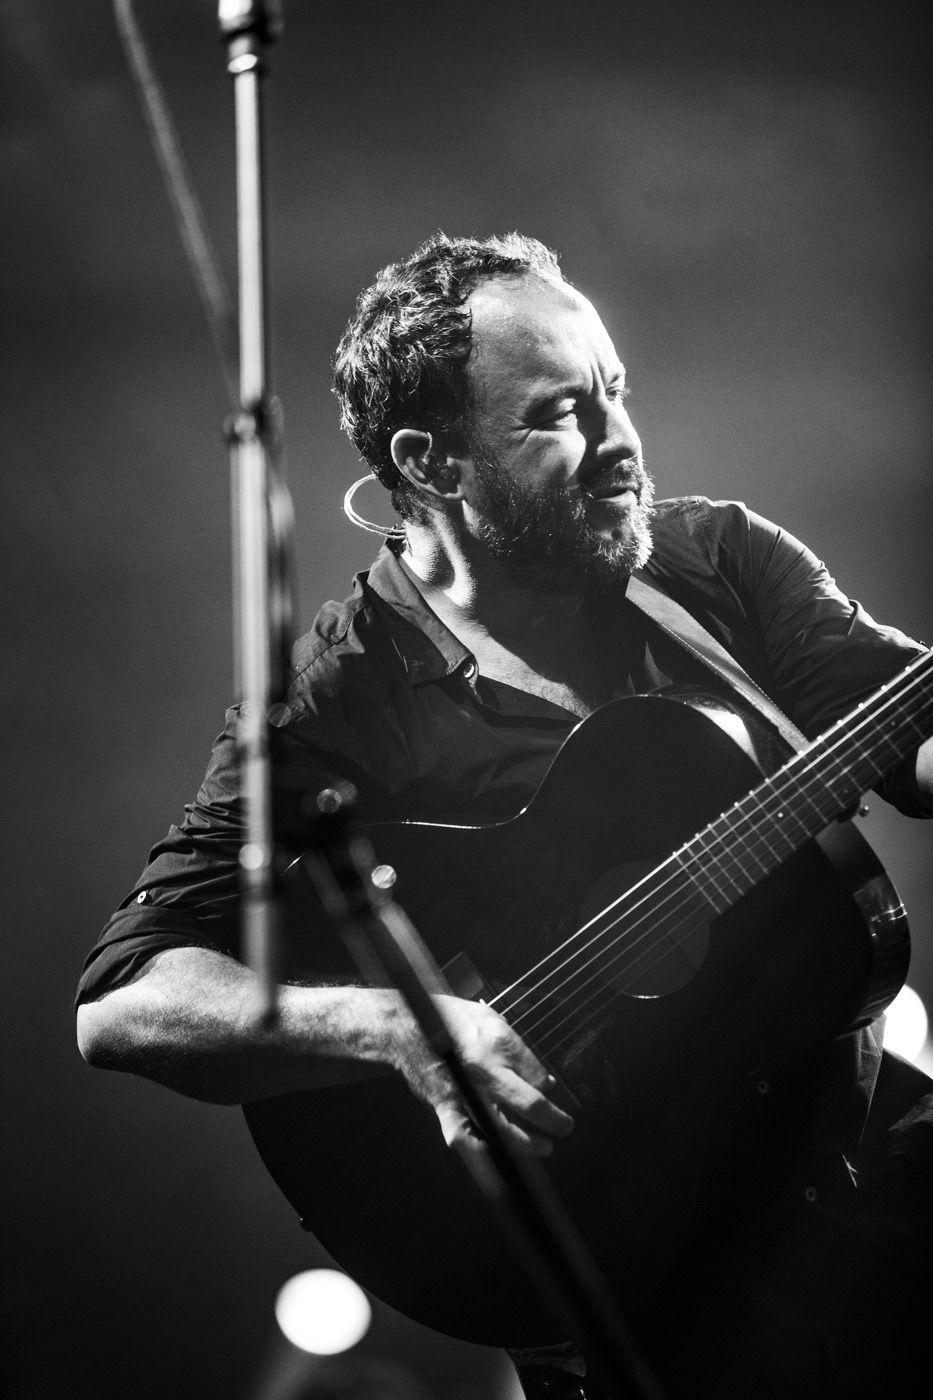 Amazon.com - (24x36) Dave Matthews Band (Dave, Black